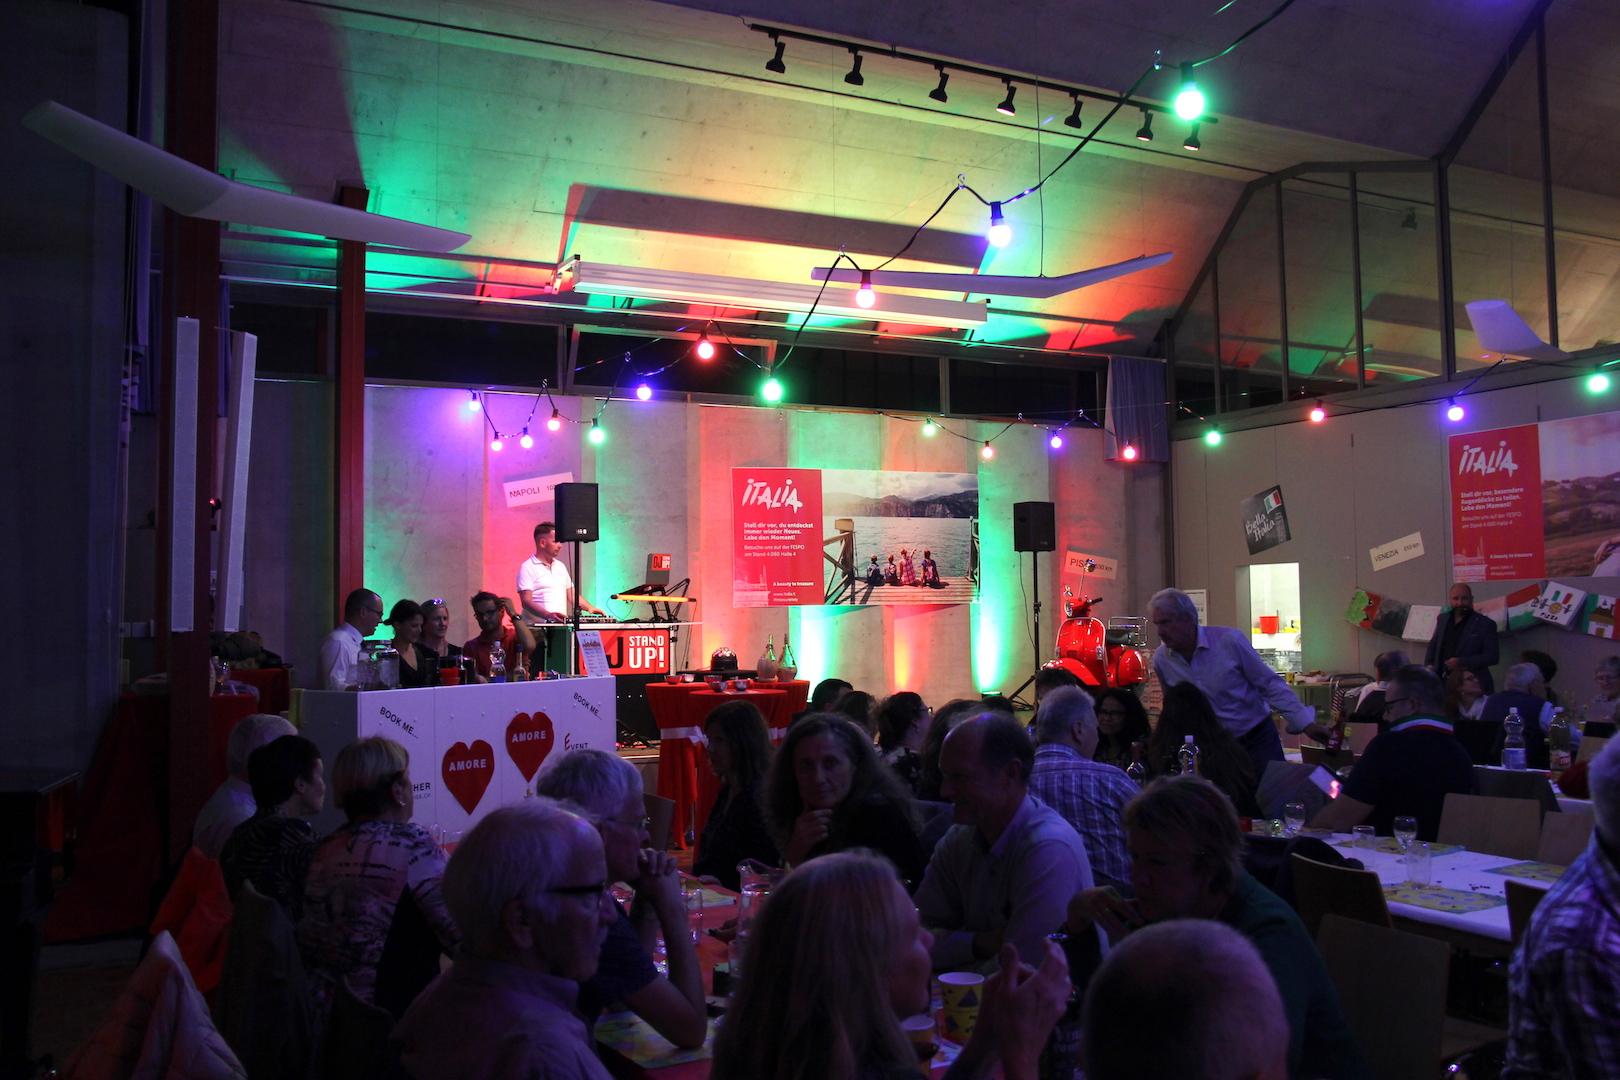 Pfarreifest 2019 mit viel Publikum